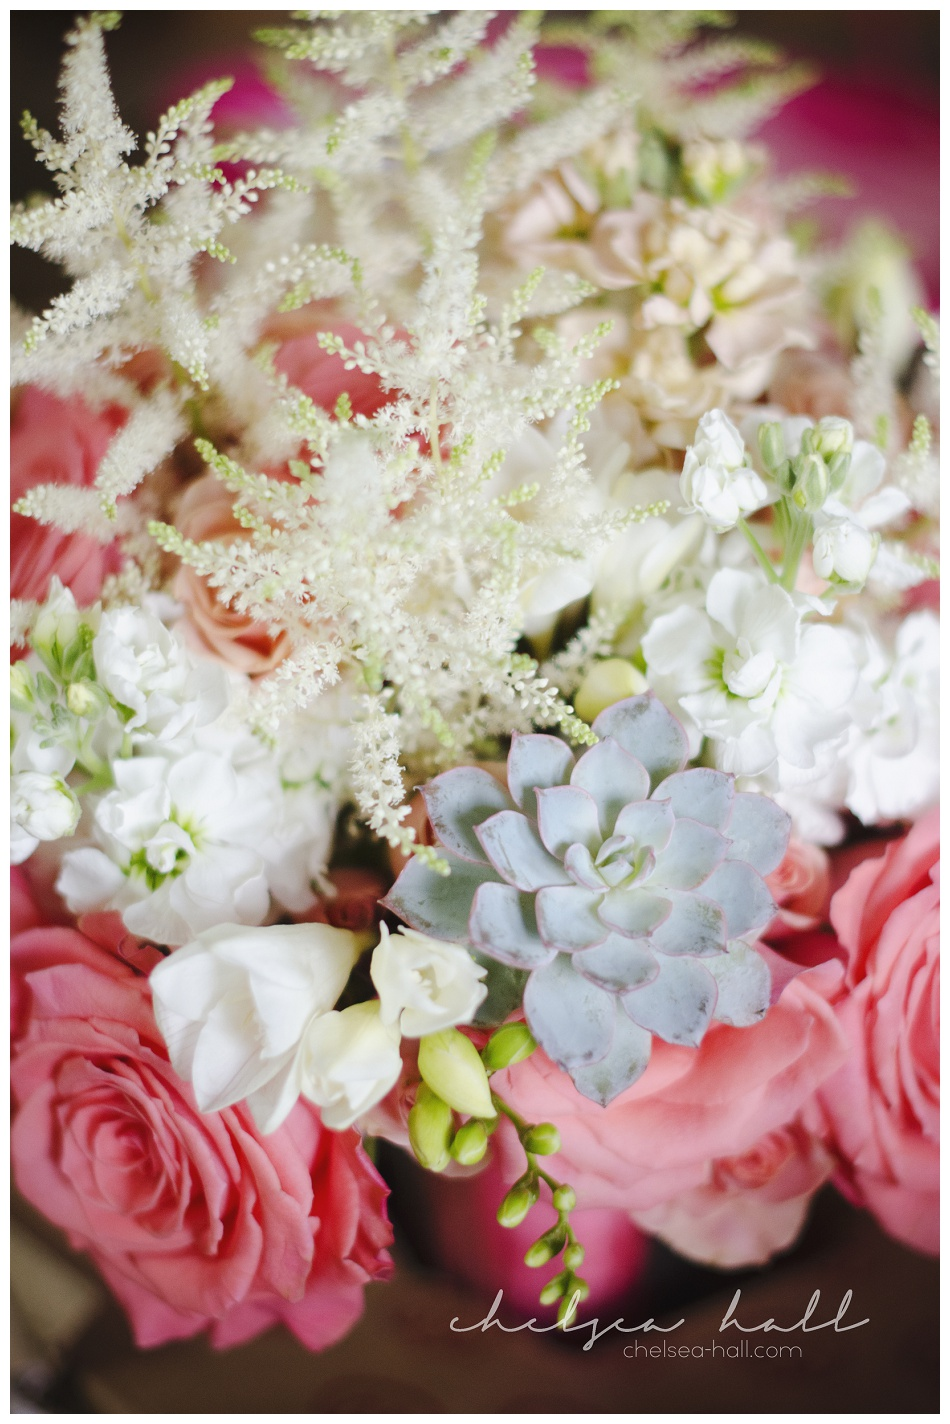 Chelsea Hall Photography, Dayton Wedding Photography, Kettering Wedding Photographer_0005